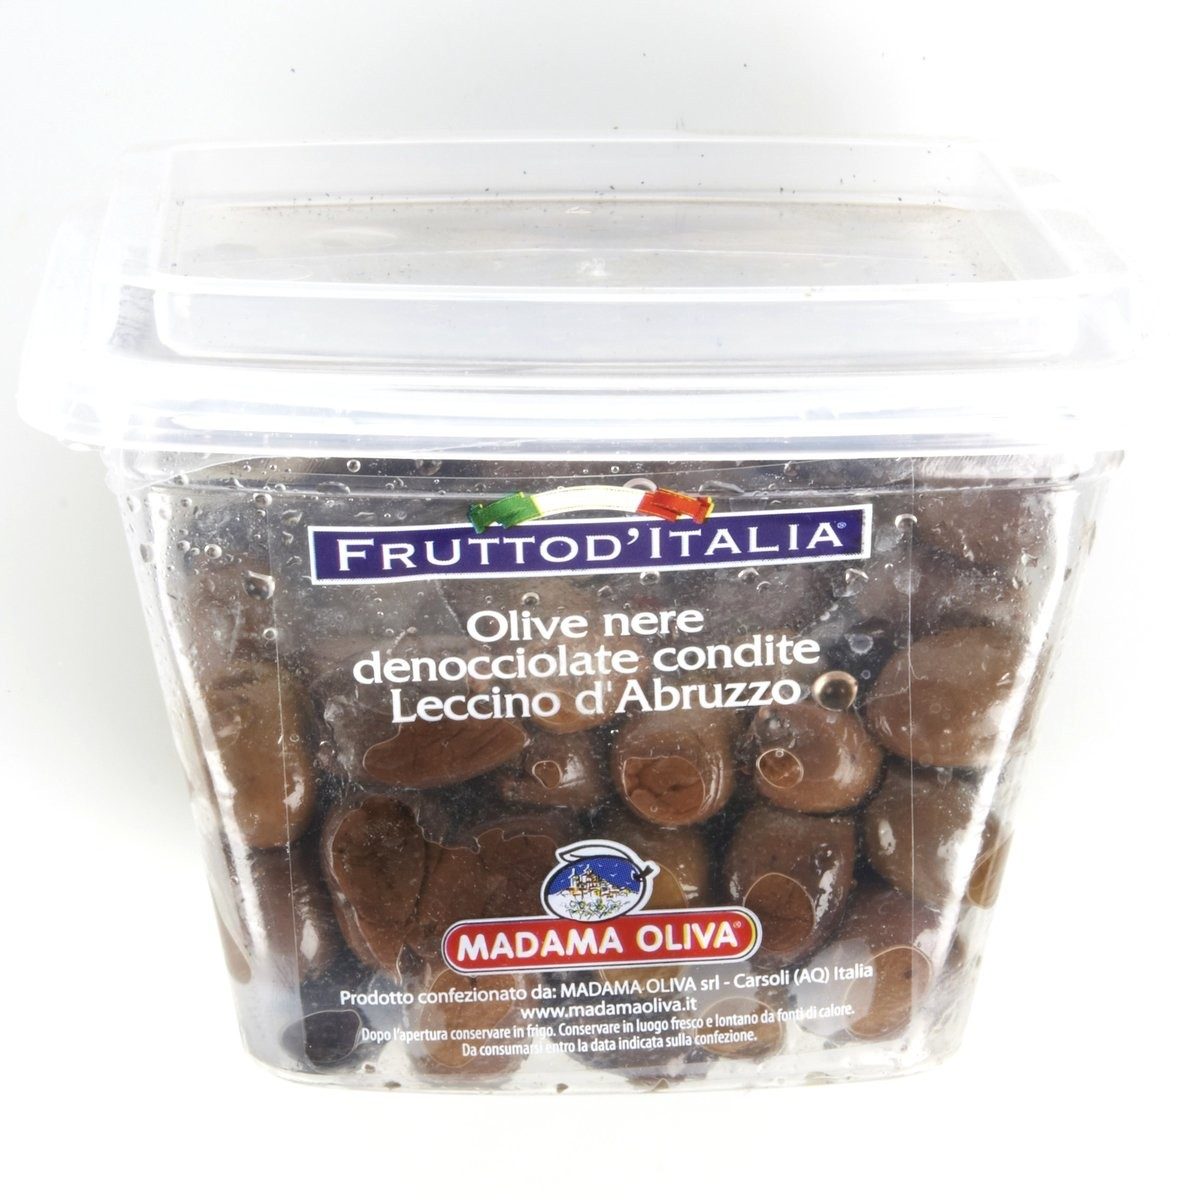 Madama Oliva Olive nere denocciolate condite